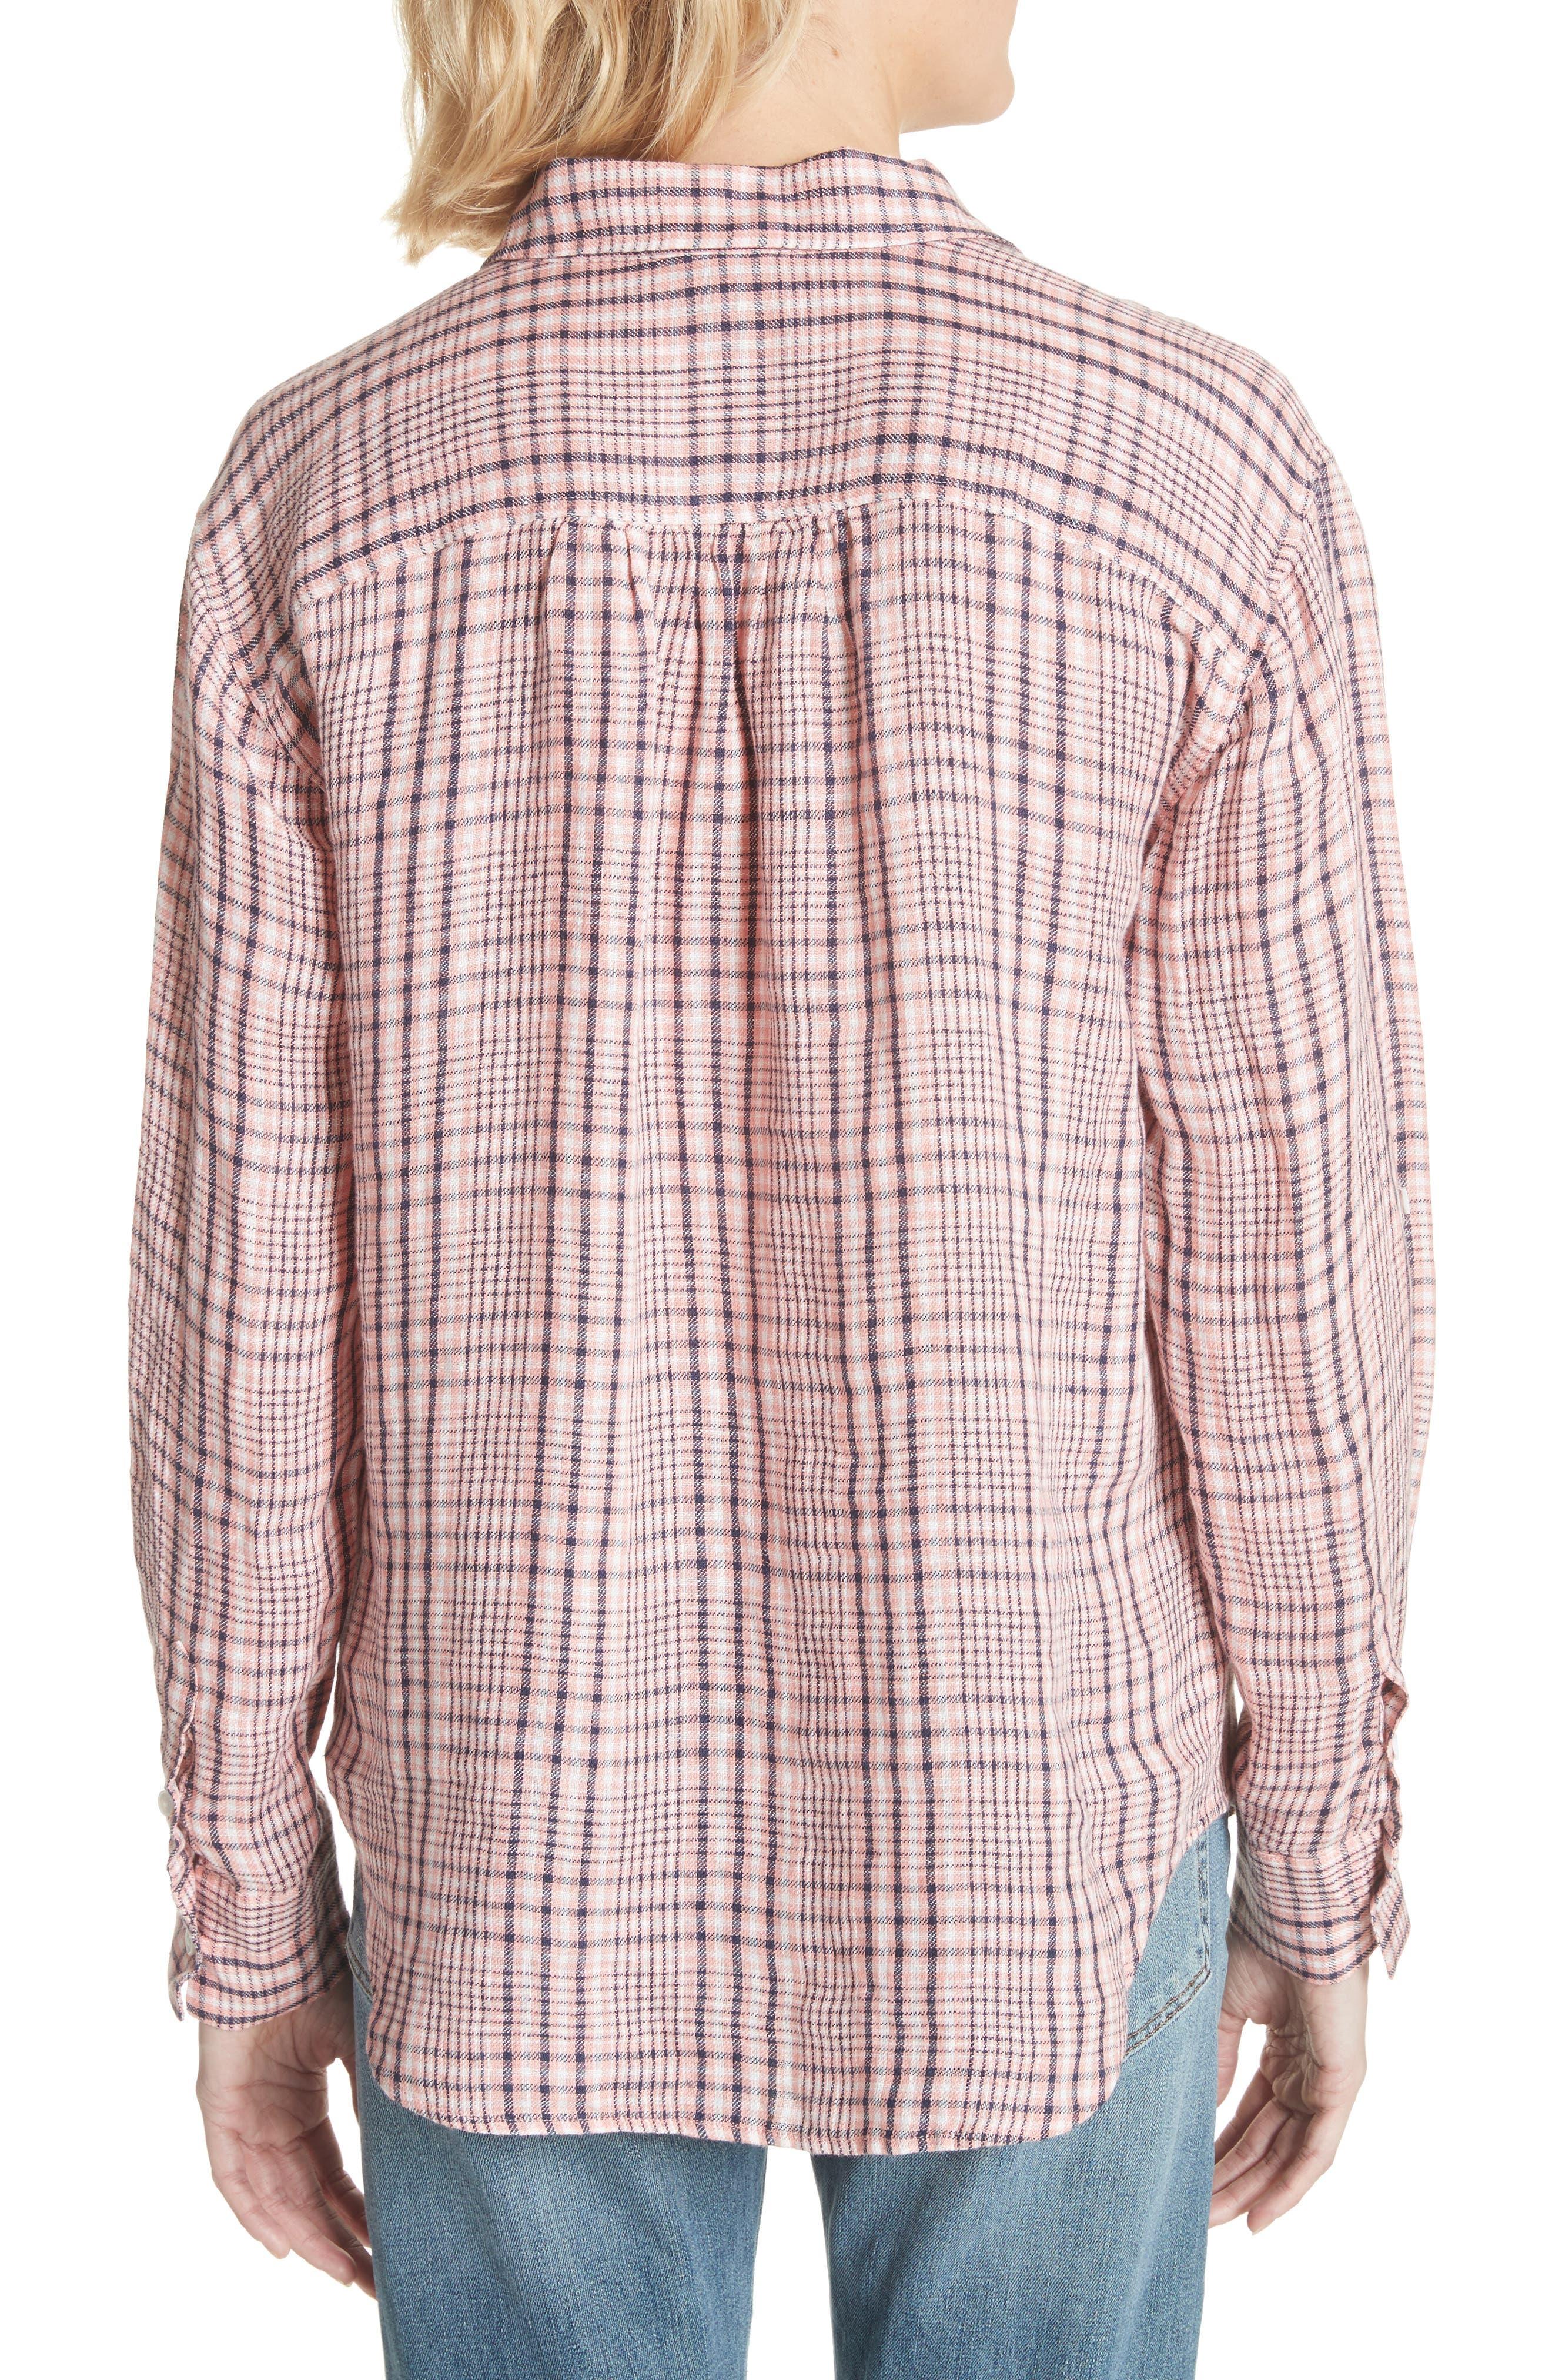 Lidelle Plaid Linen Shirt,                             Alternate thumbnail 2, color,                             Baci